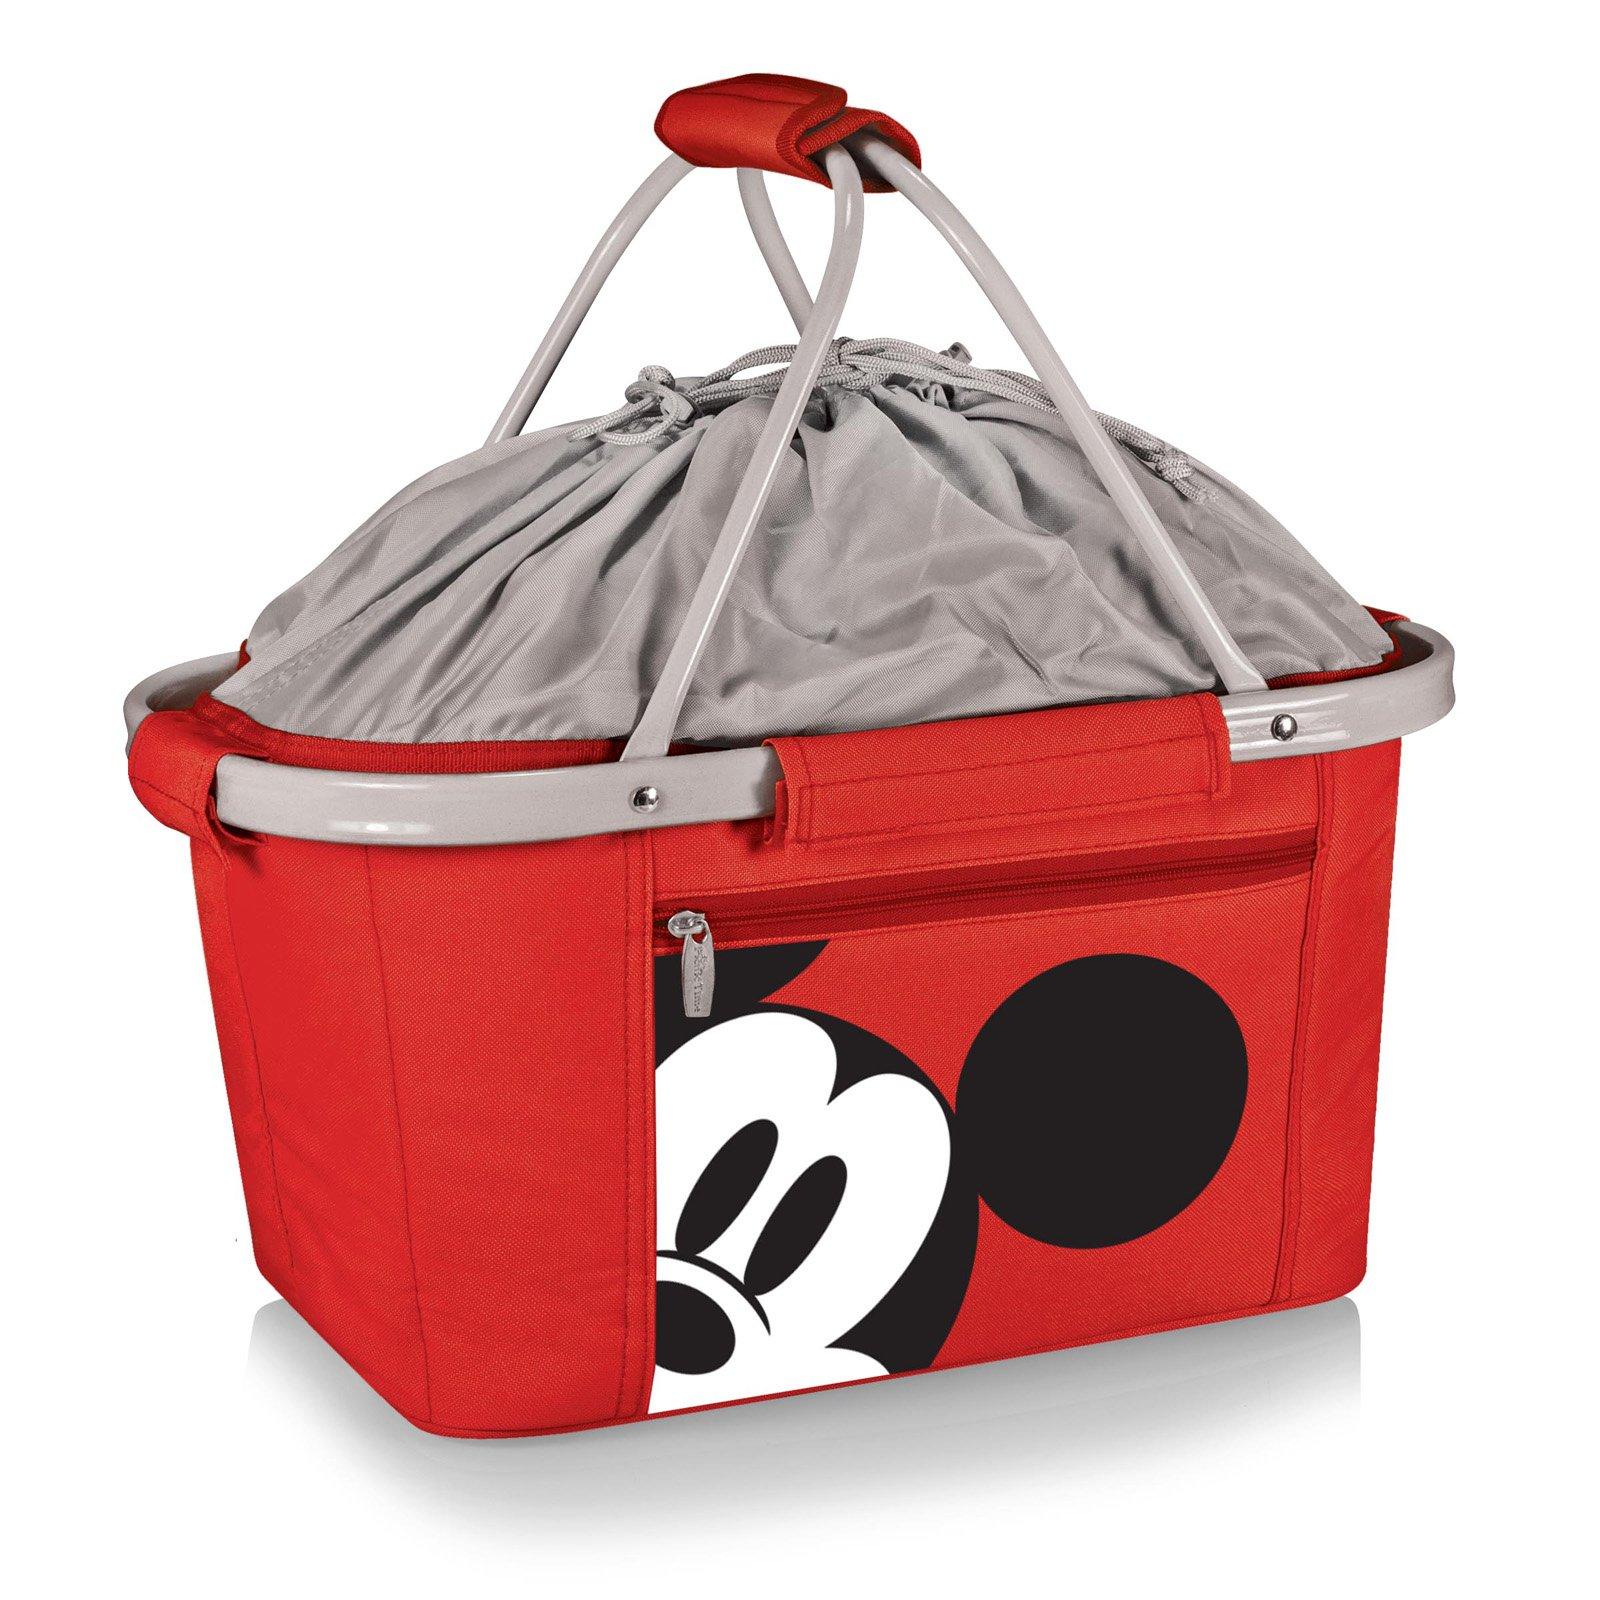 Picnic Time Disney Metro Basket Collapsible Cooler Tote